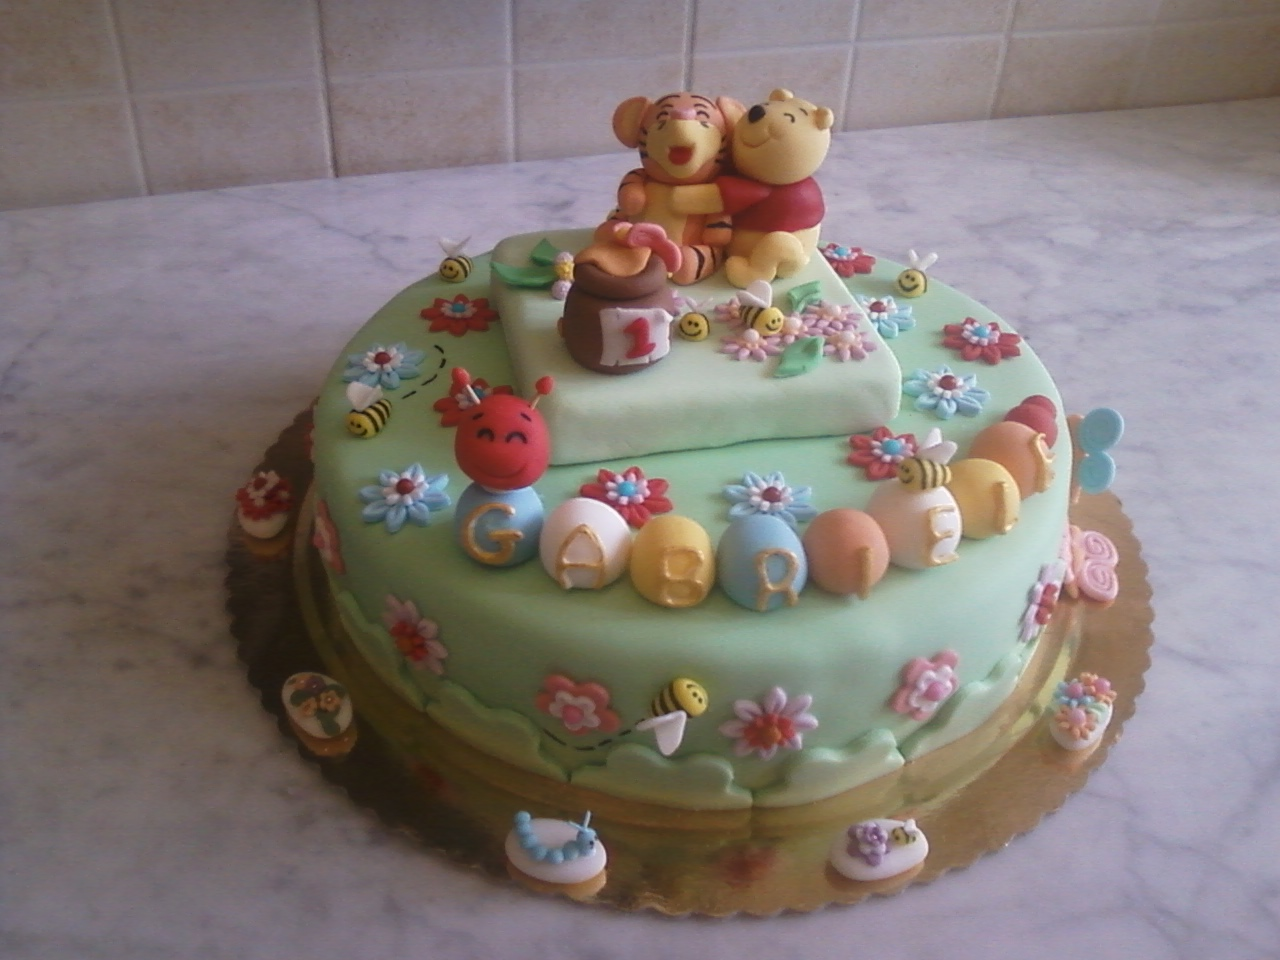 Torta winnie the pooh 2 da cuore dolce su akkiapparicette for Winnie pooh ka che